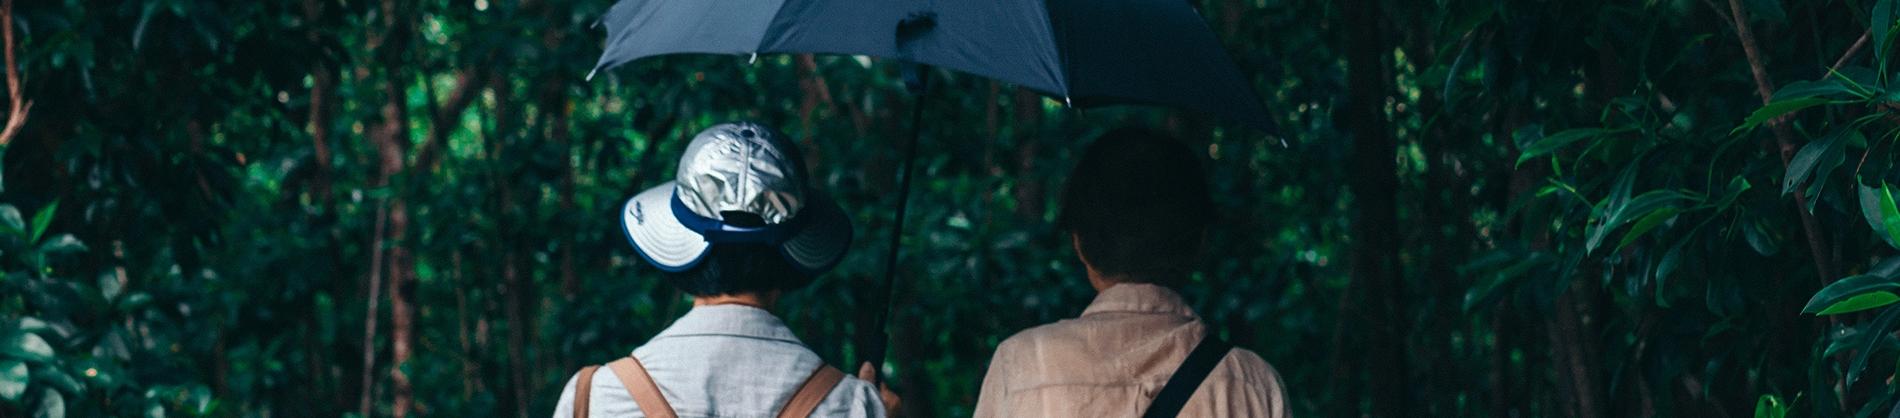 Two elderly women talking through a park with an umbrella up